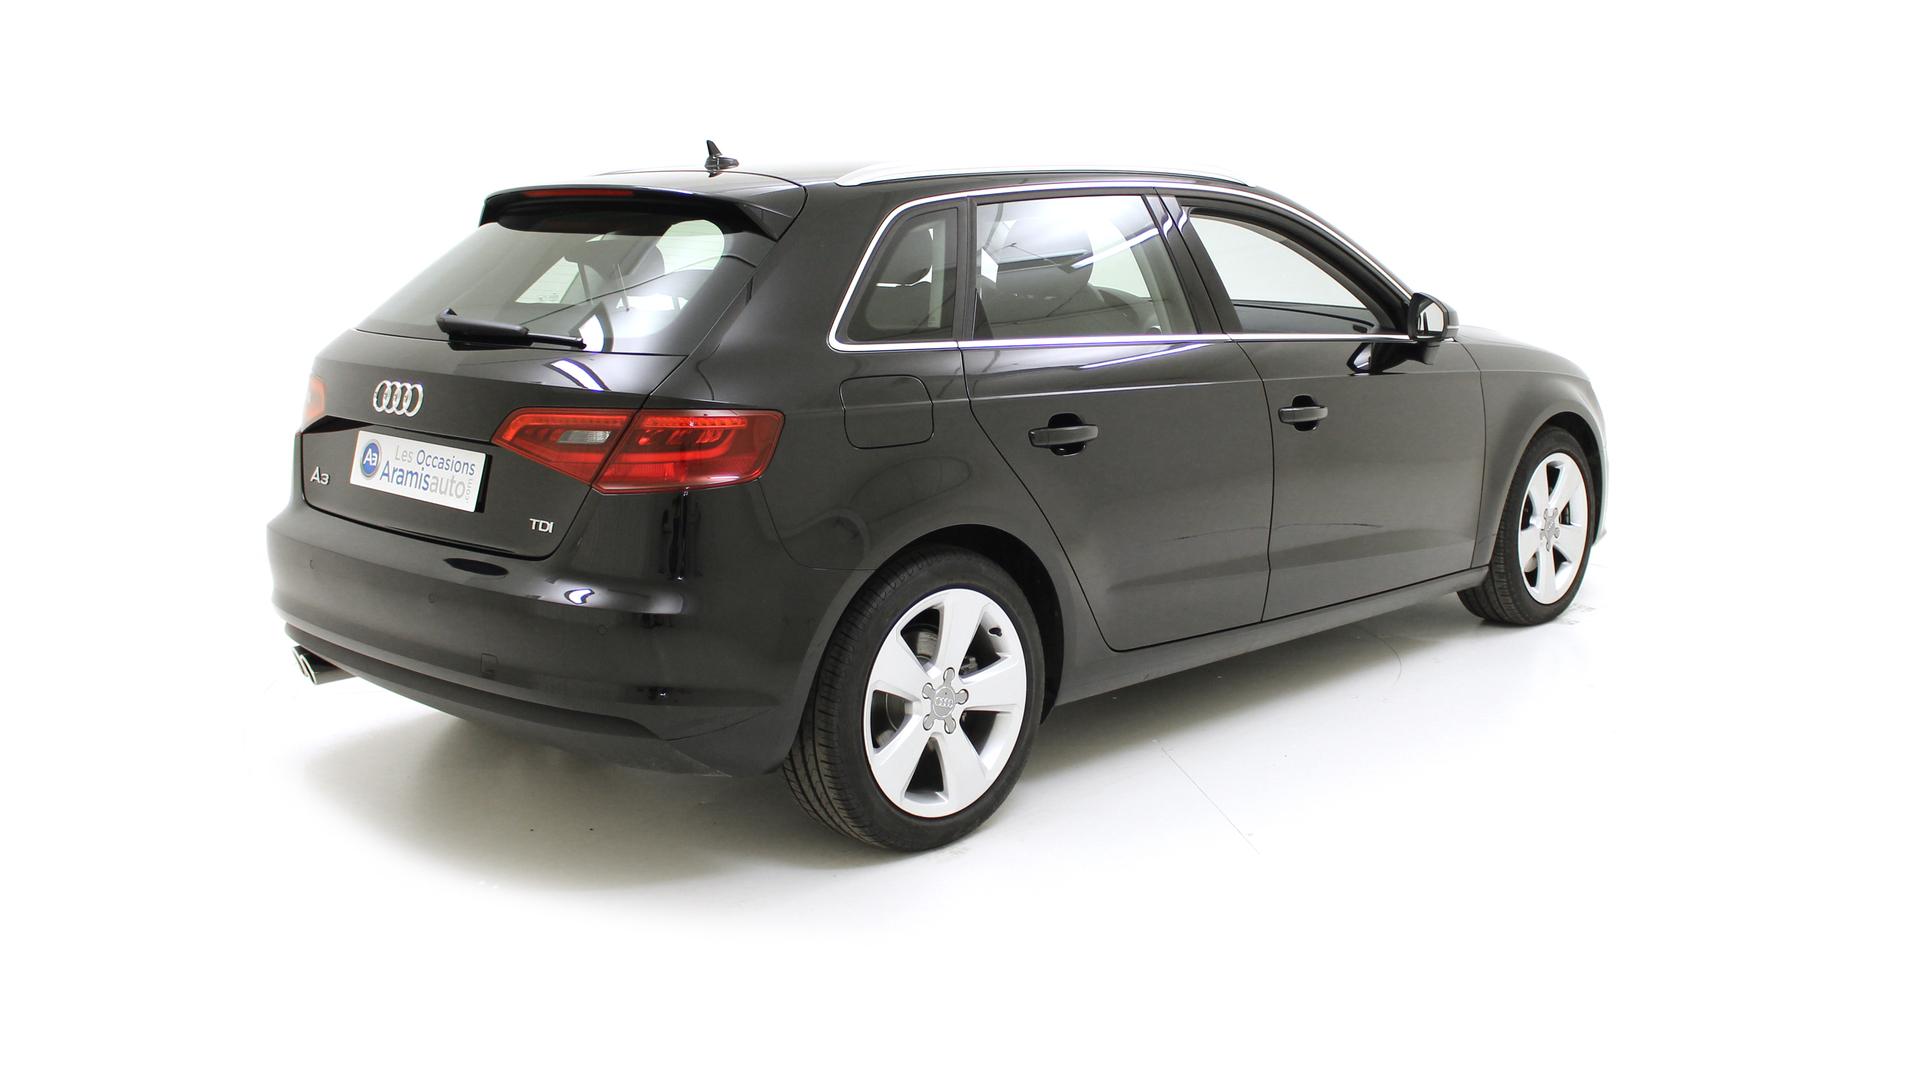 audi a3 sportback berline compacte 5 portes diesel 2 0 tdi 150 bo te manuelle. Black Bedroom Furniture Sets. Home Design Ideas